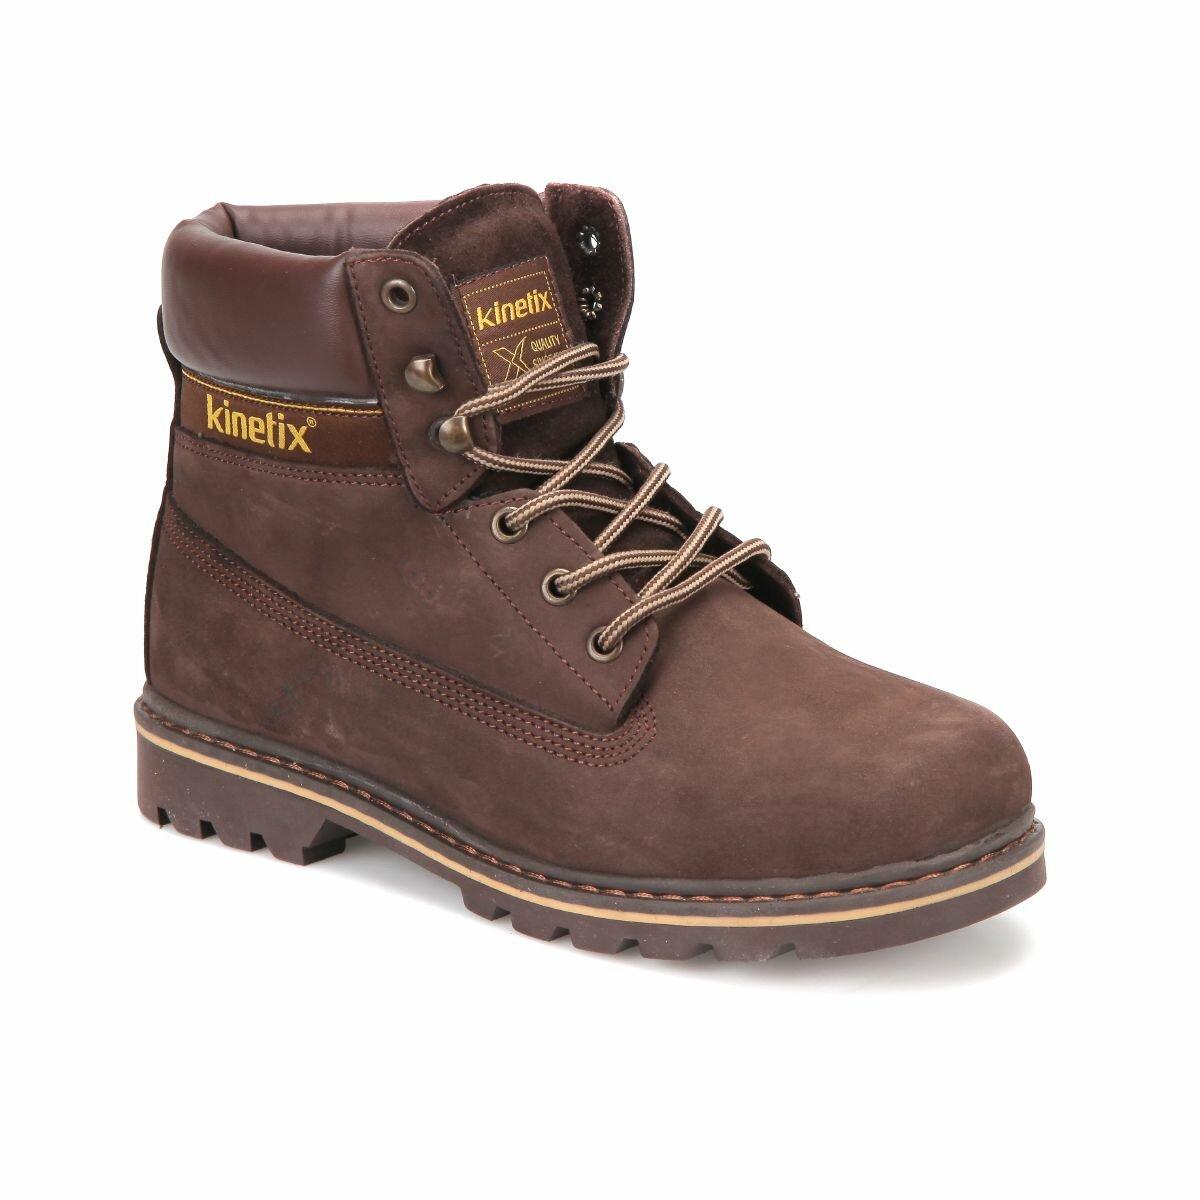 FLO JORDAN Brown Men Boots KINETIX